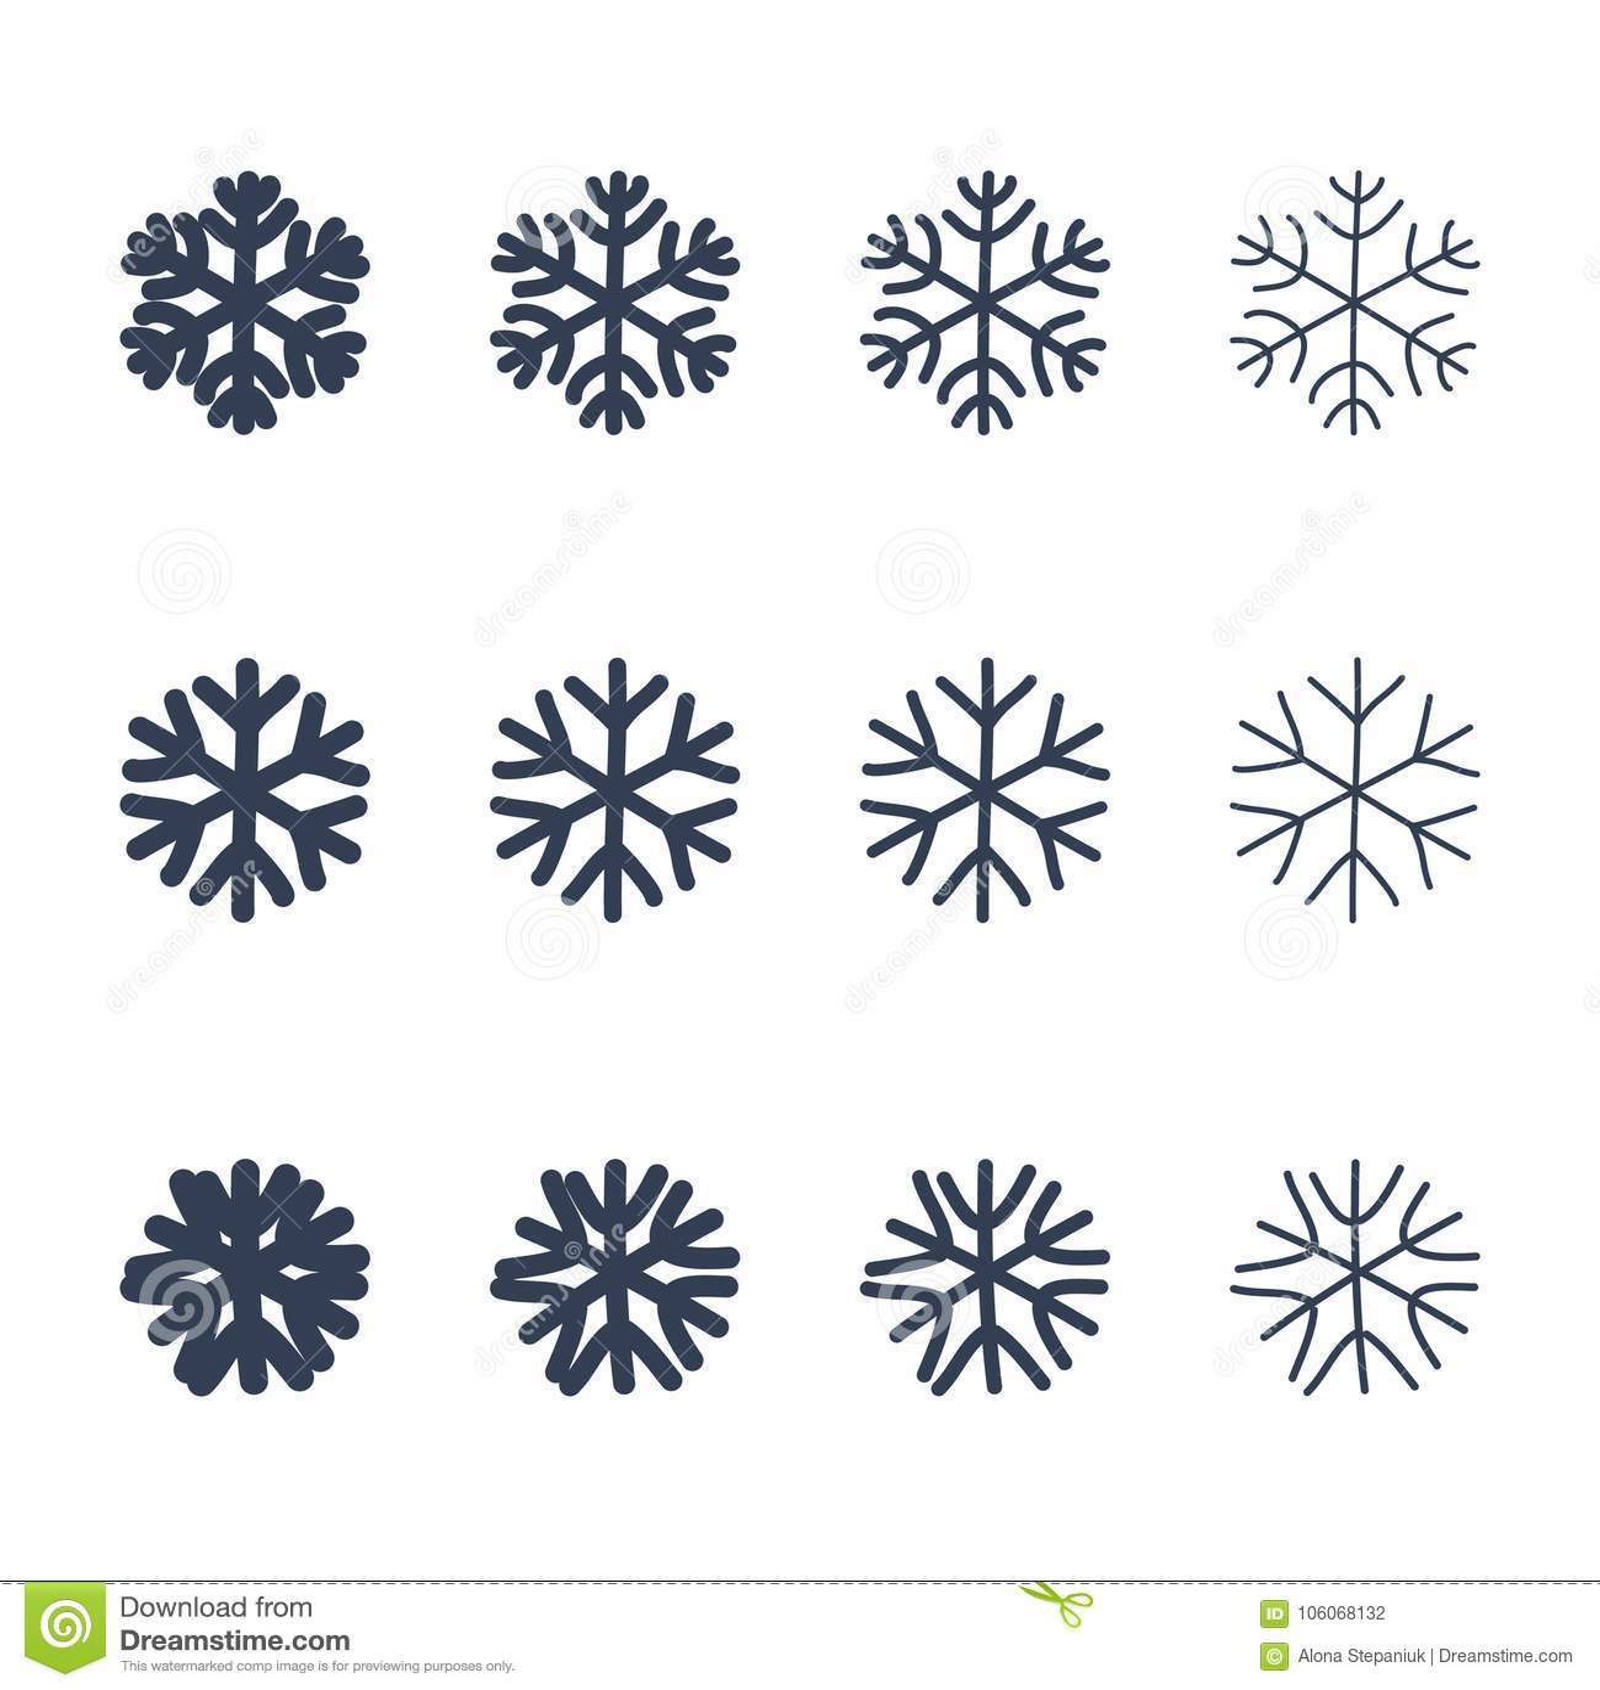 Snowflakes Signs Set Black Snowflake Icons Isolated On White